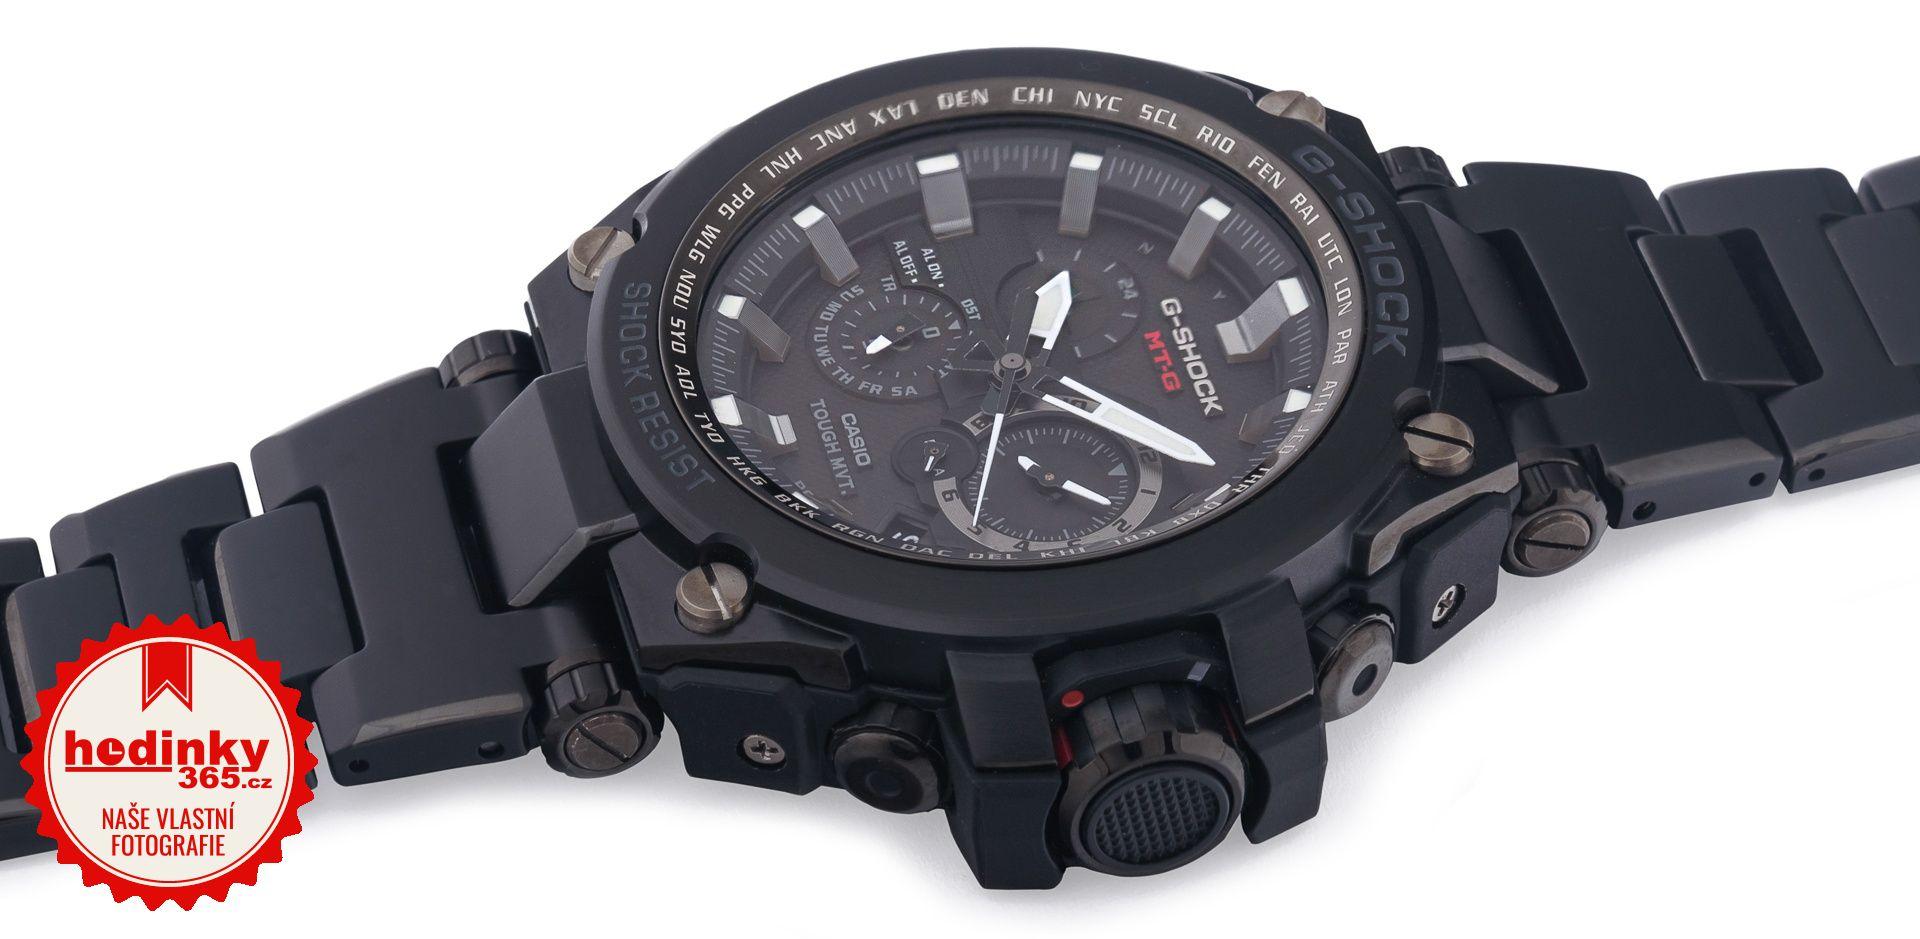 Hodinky Casio G-Shock MTG-S1000BD-1AER Limited Edition b6147fc8d84